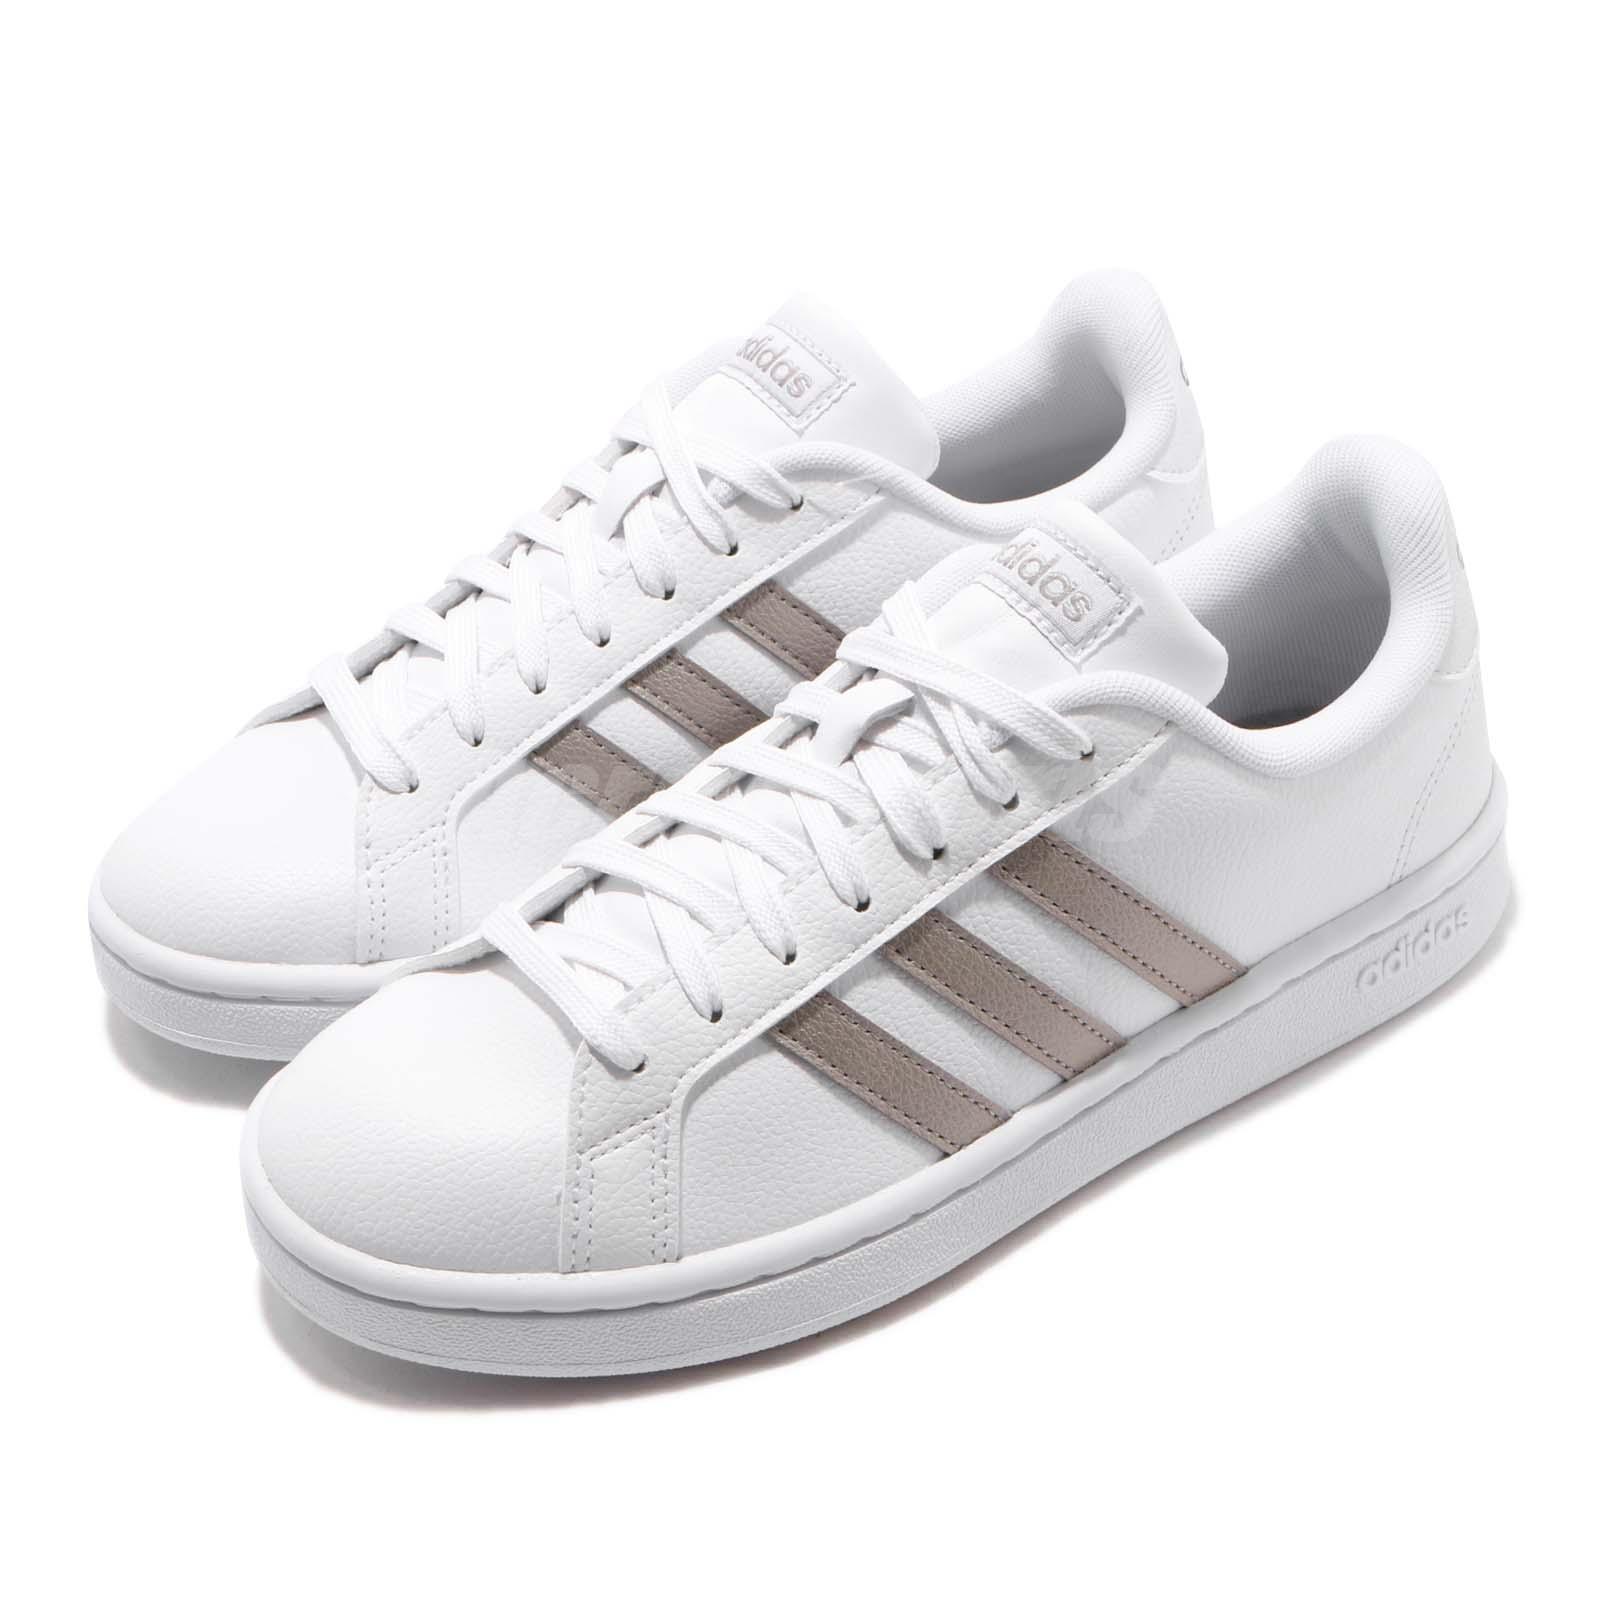 adidas grand court donna white platinum